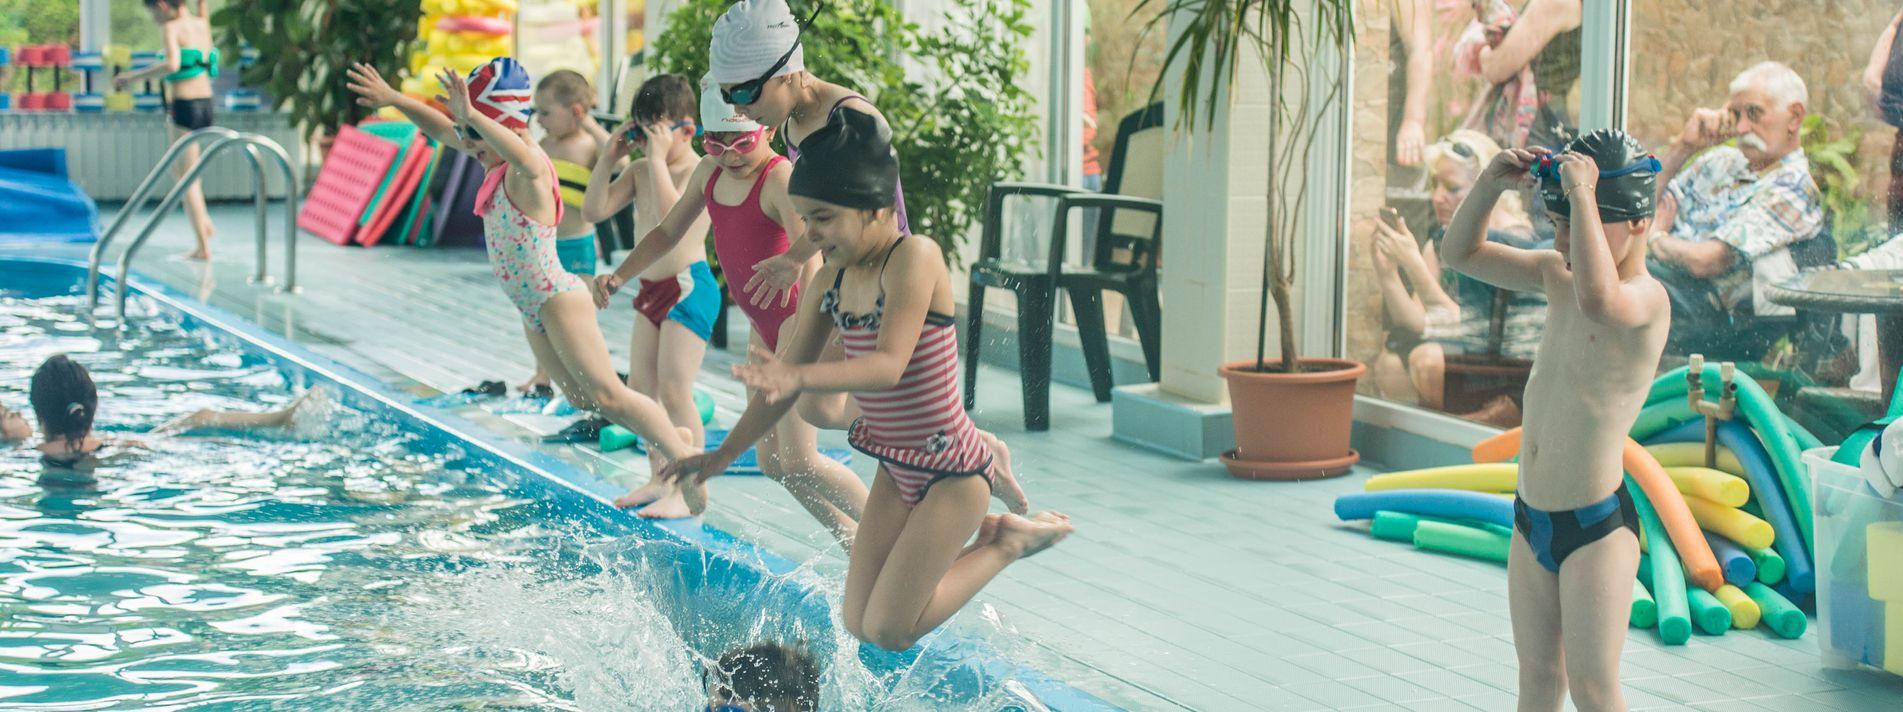 Cursuri de inot pentru copii | Sport Ski Club | Brasov